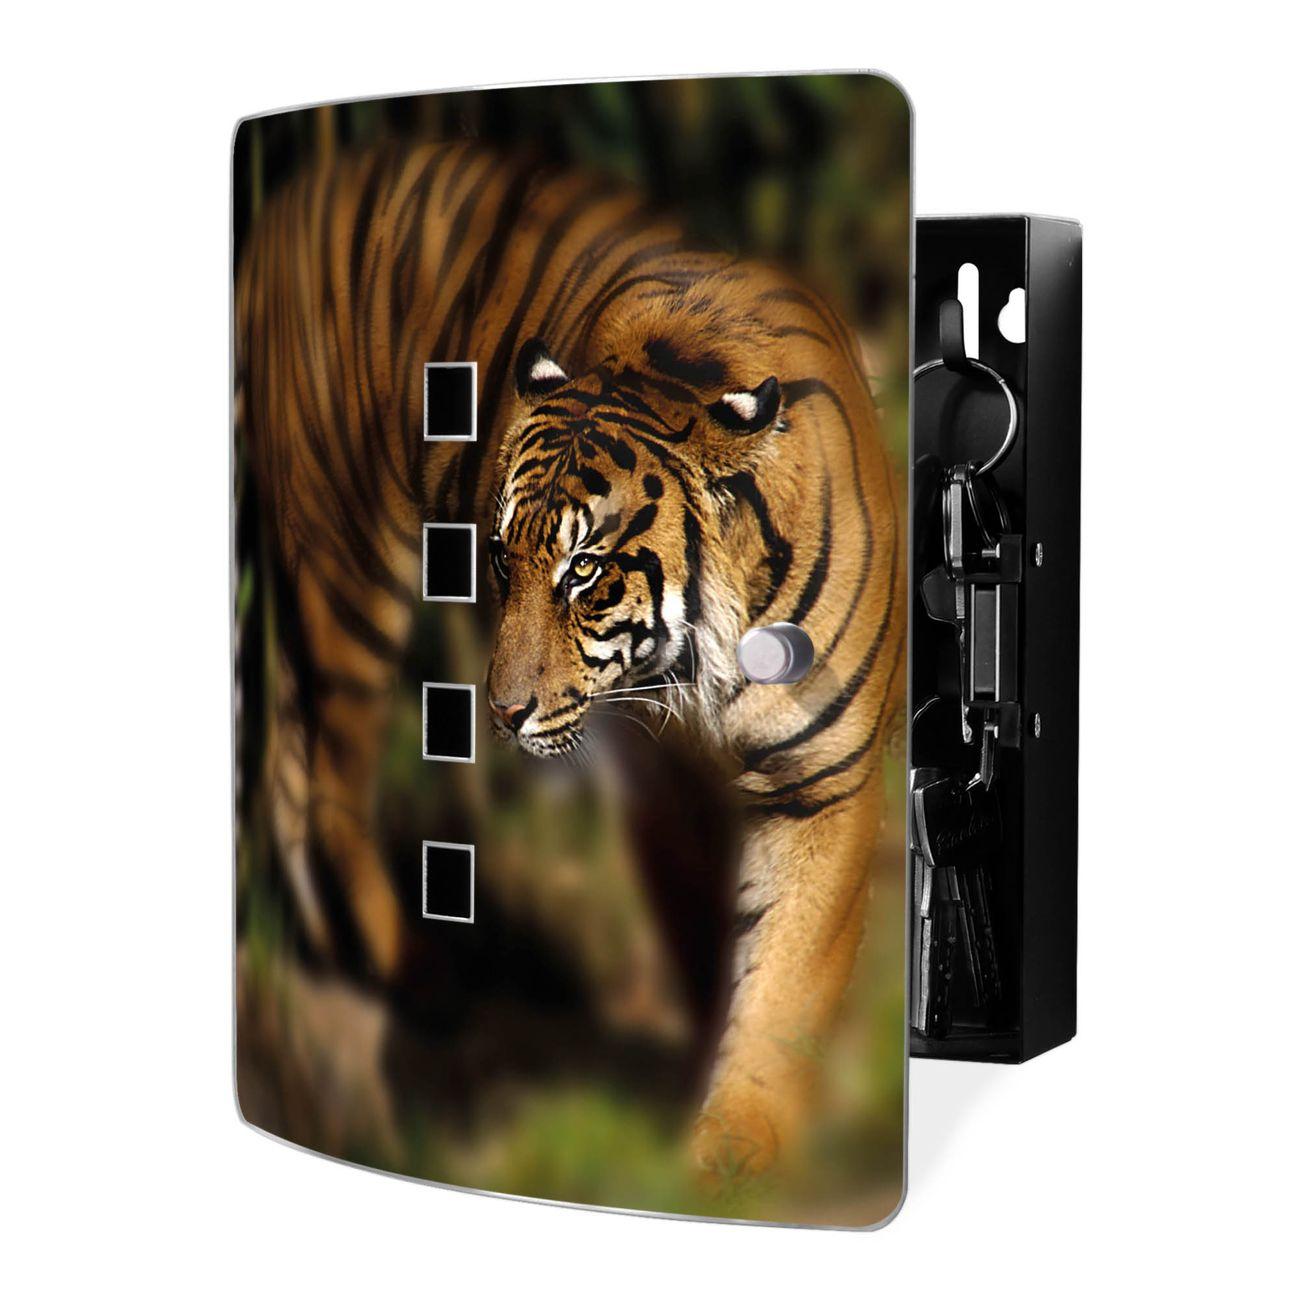 Schlüsselkasten Motiv Tiger